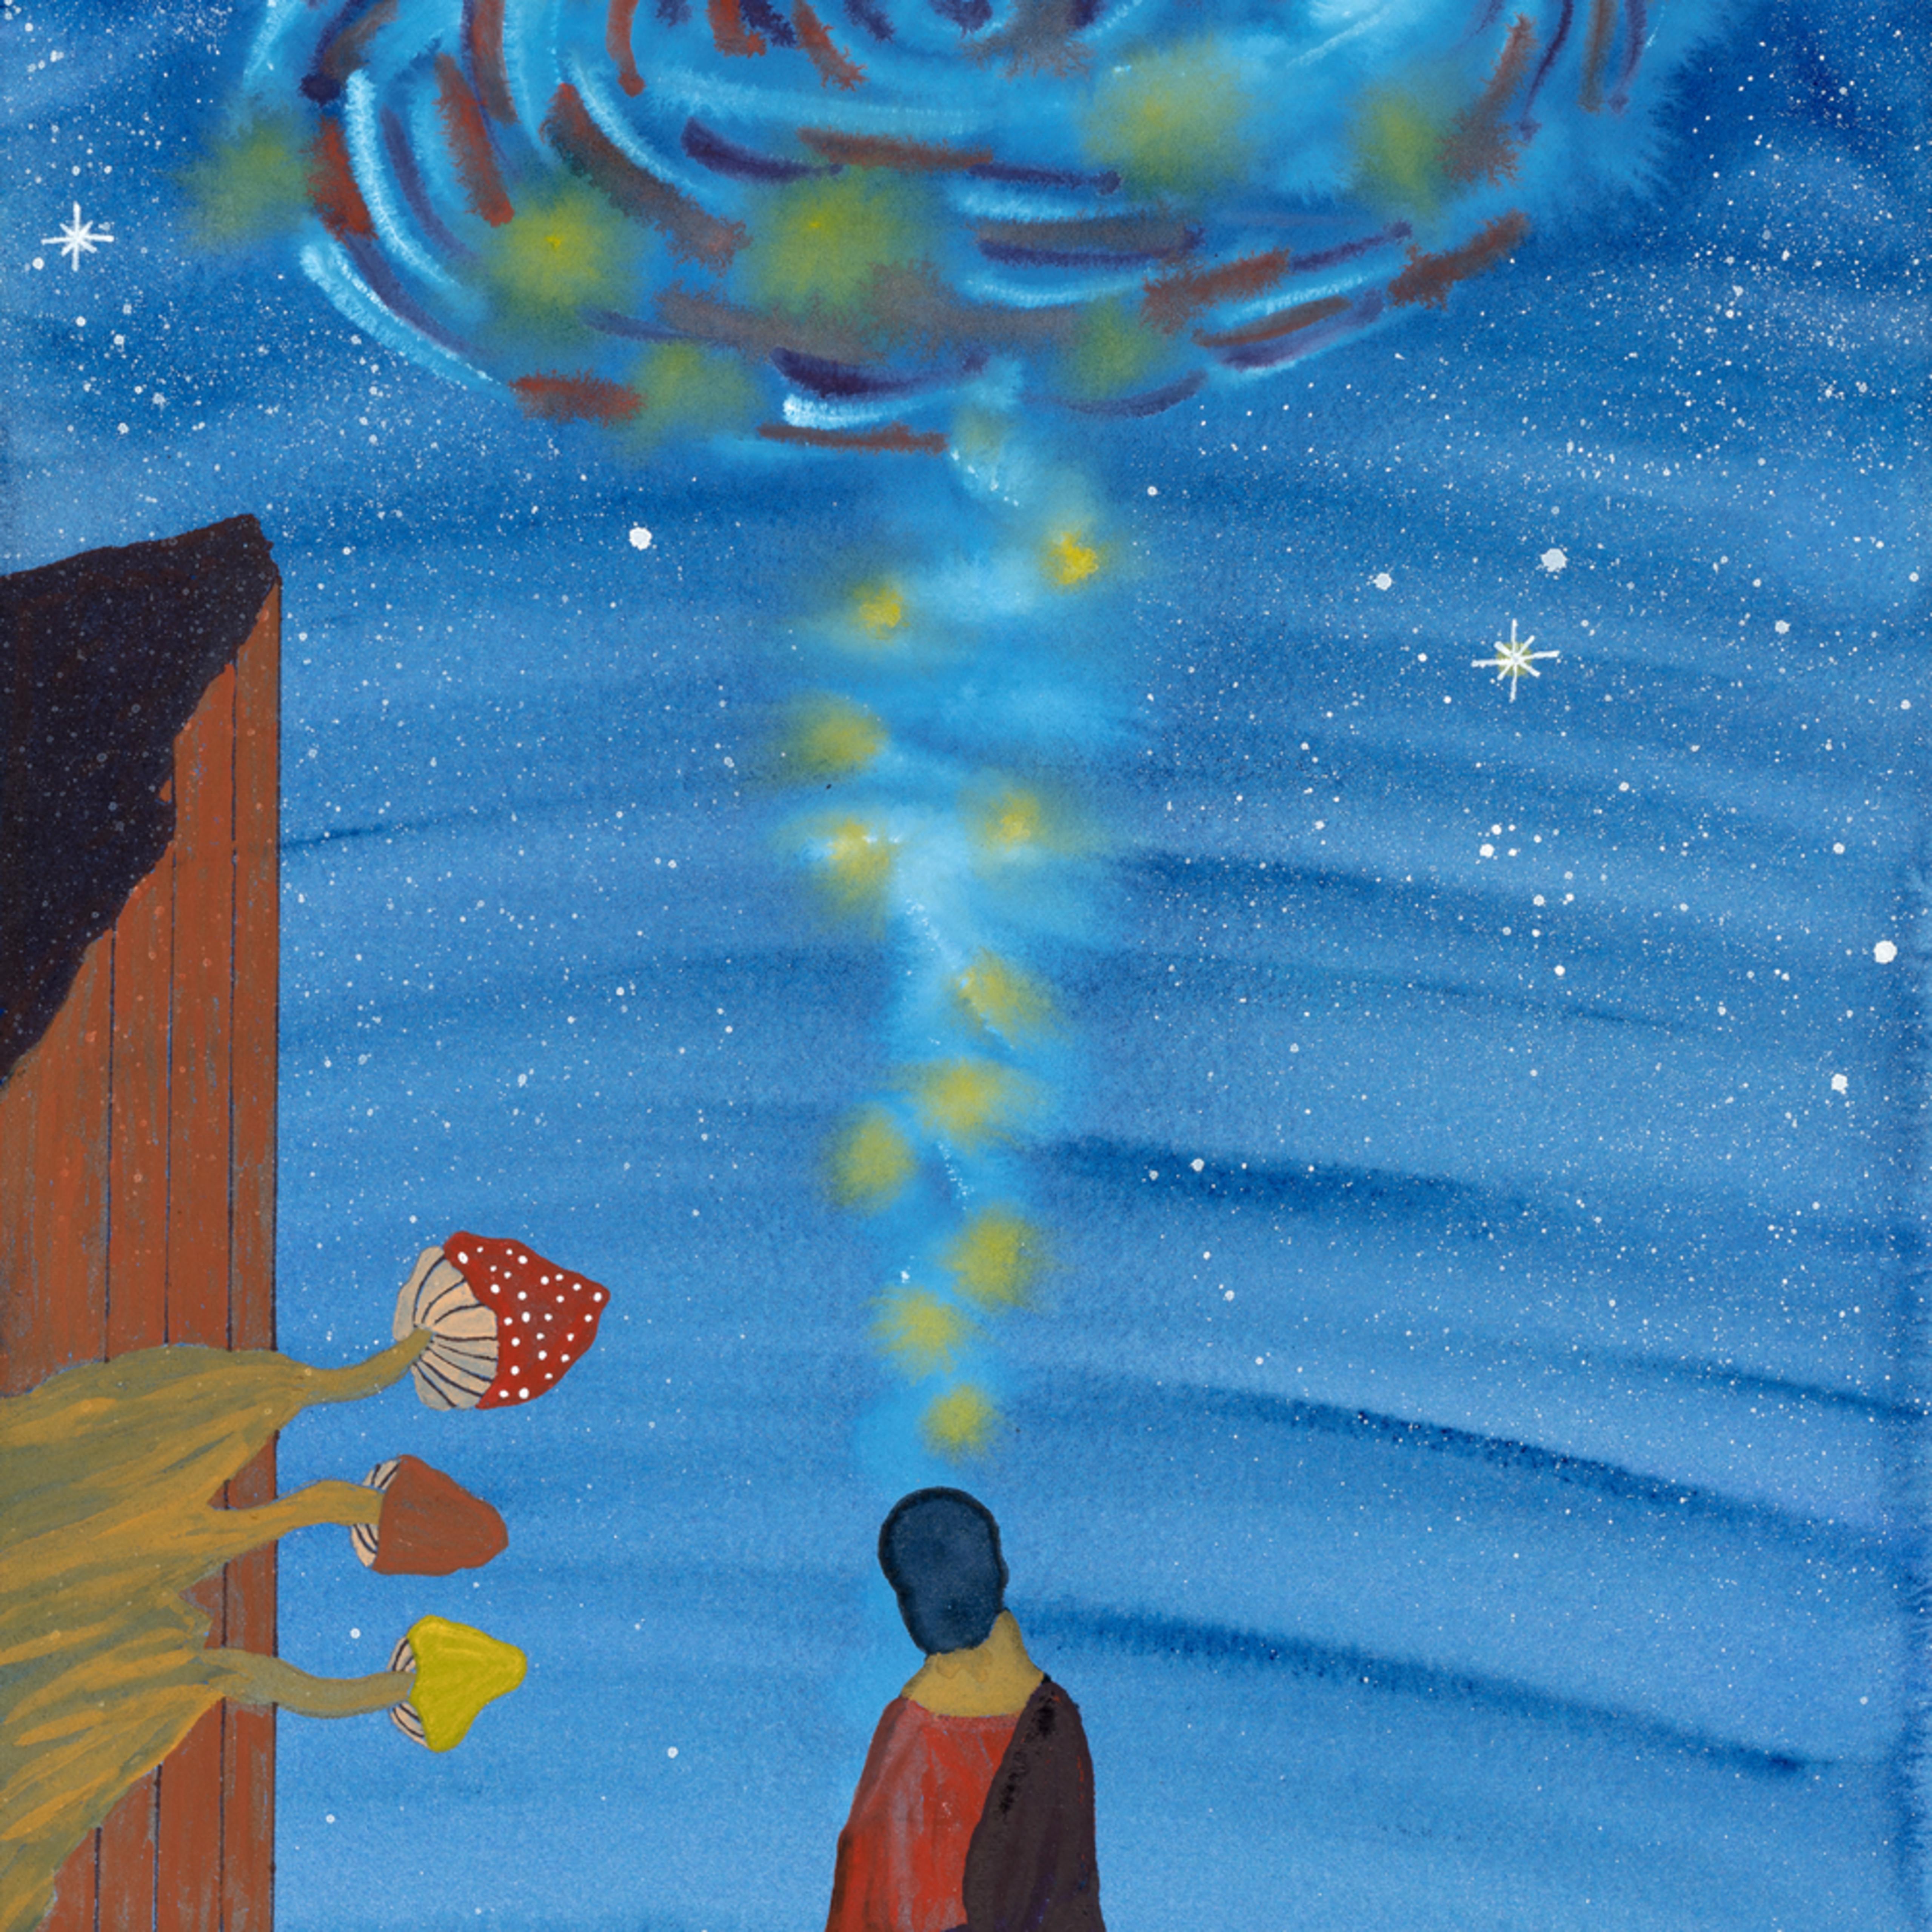 Materialization of consciousness wgwnfd